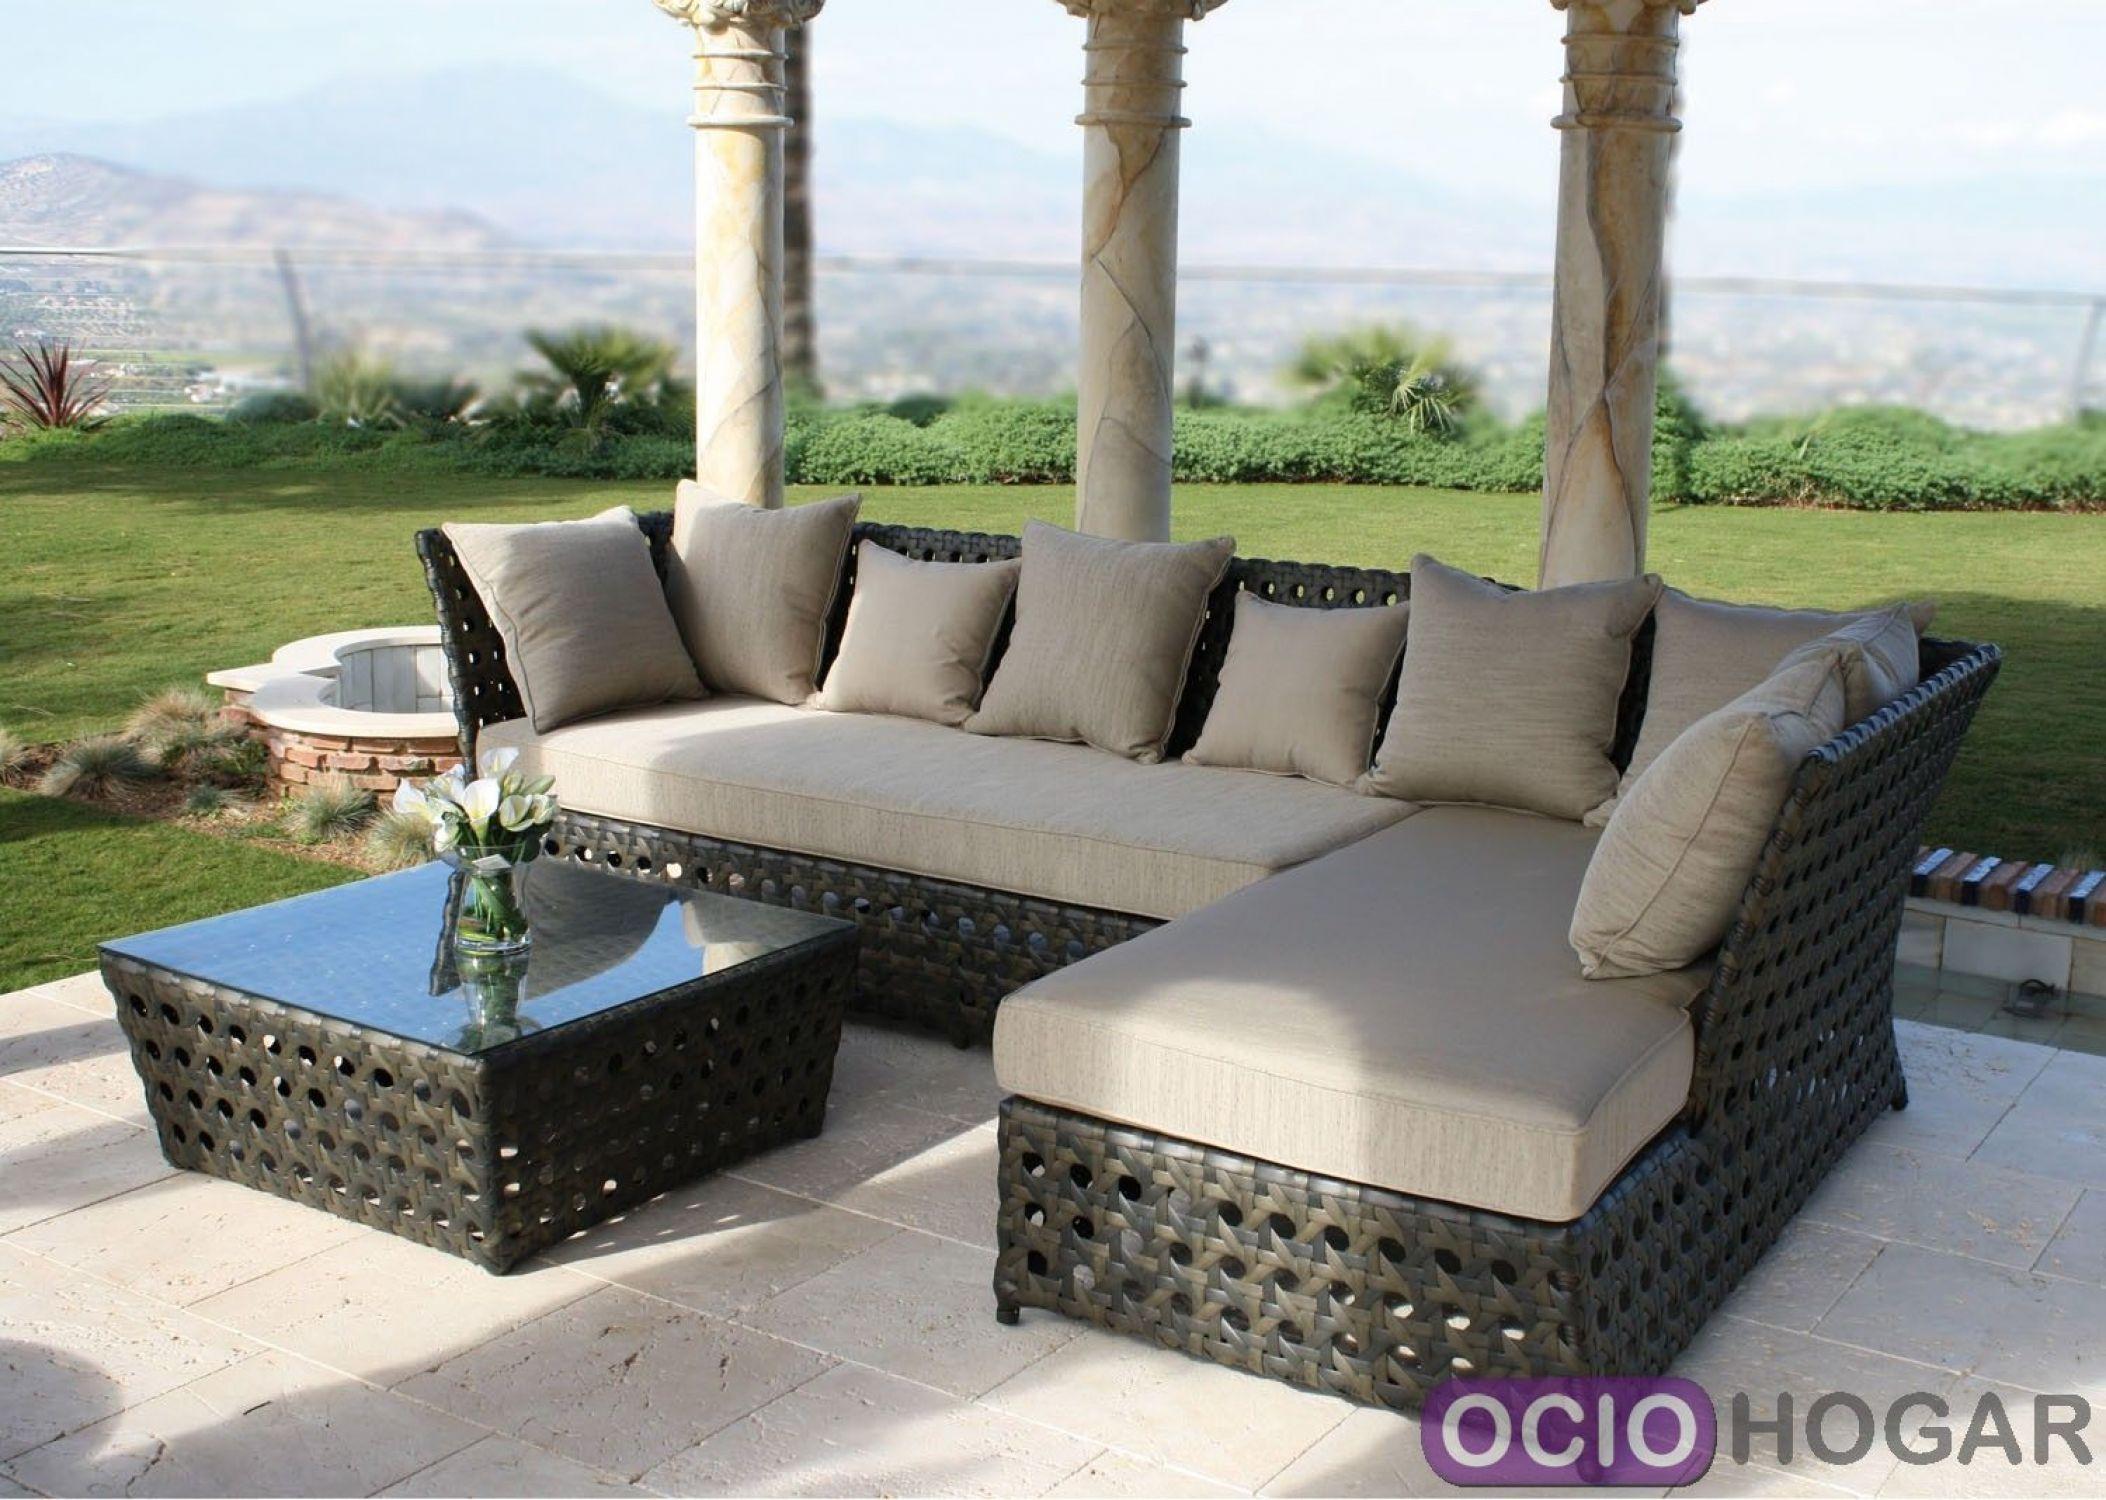 Muebles de exterior blog ociohogar for Muebles de jardin exterior